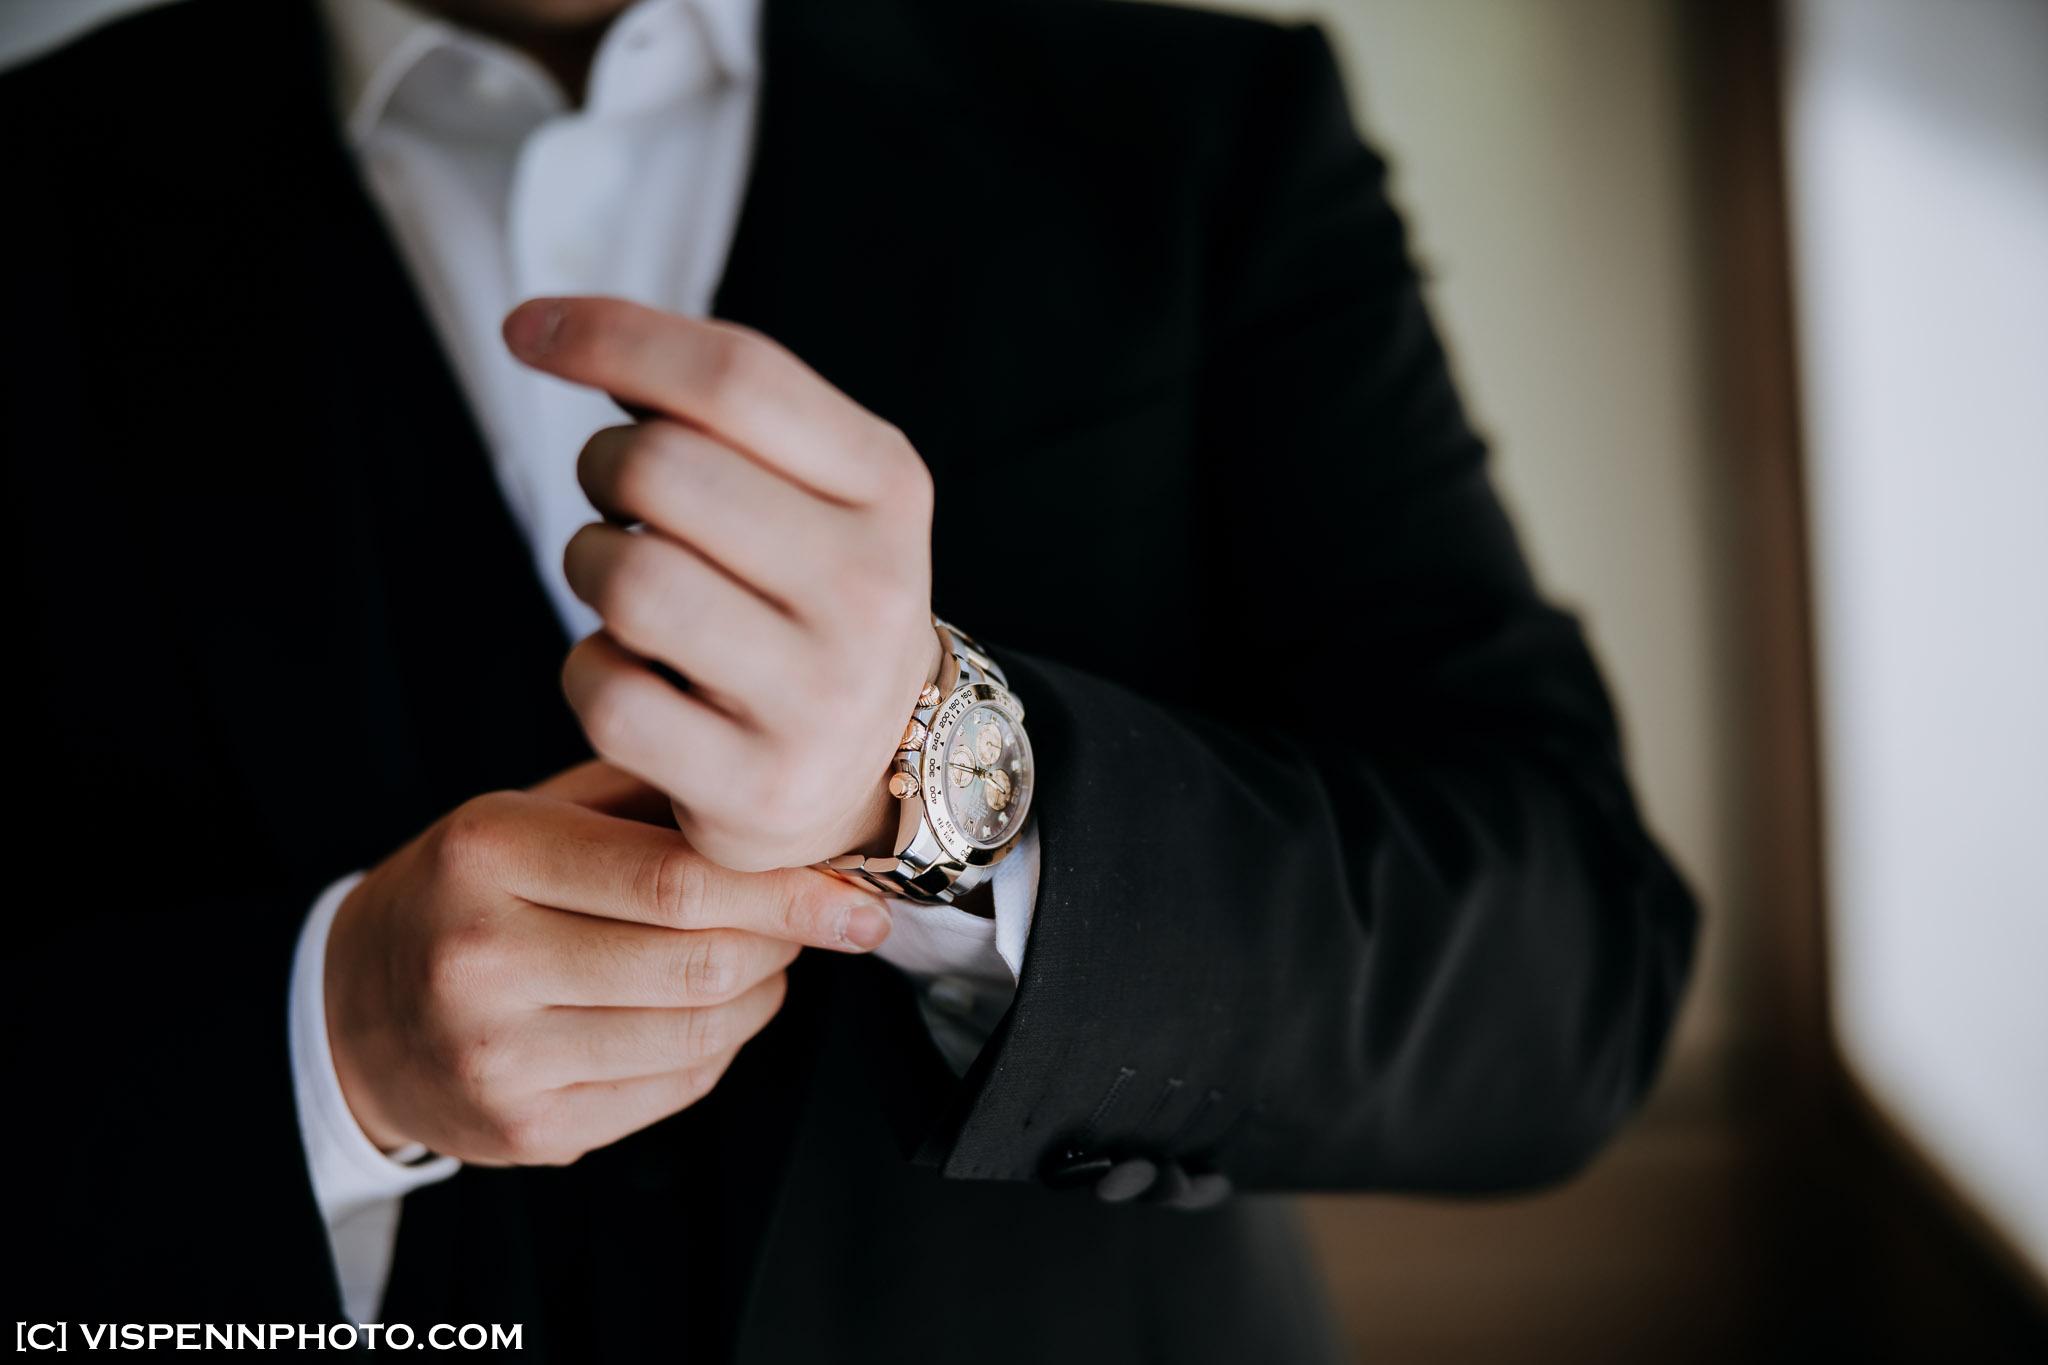 WEDDING DAY Photography Melbourne VISPENN 墨尔本 婚礼跟拍 婚礼摄像 婚礼摄影 结婚照 登记照 ElitaPB 04469 1P EOSR VISPENN